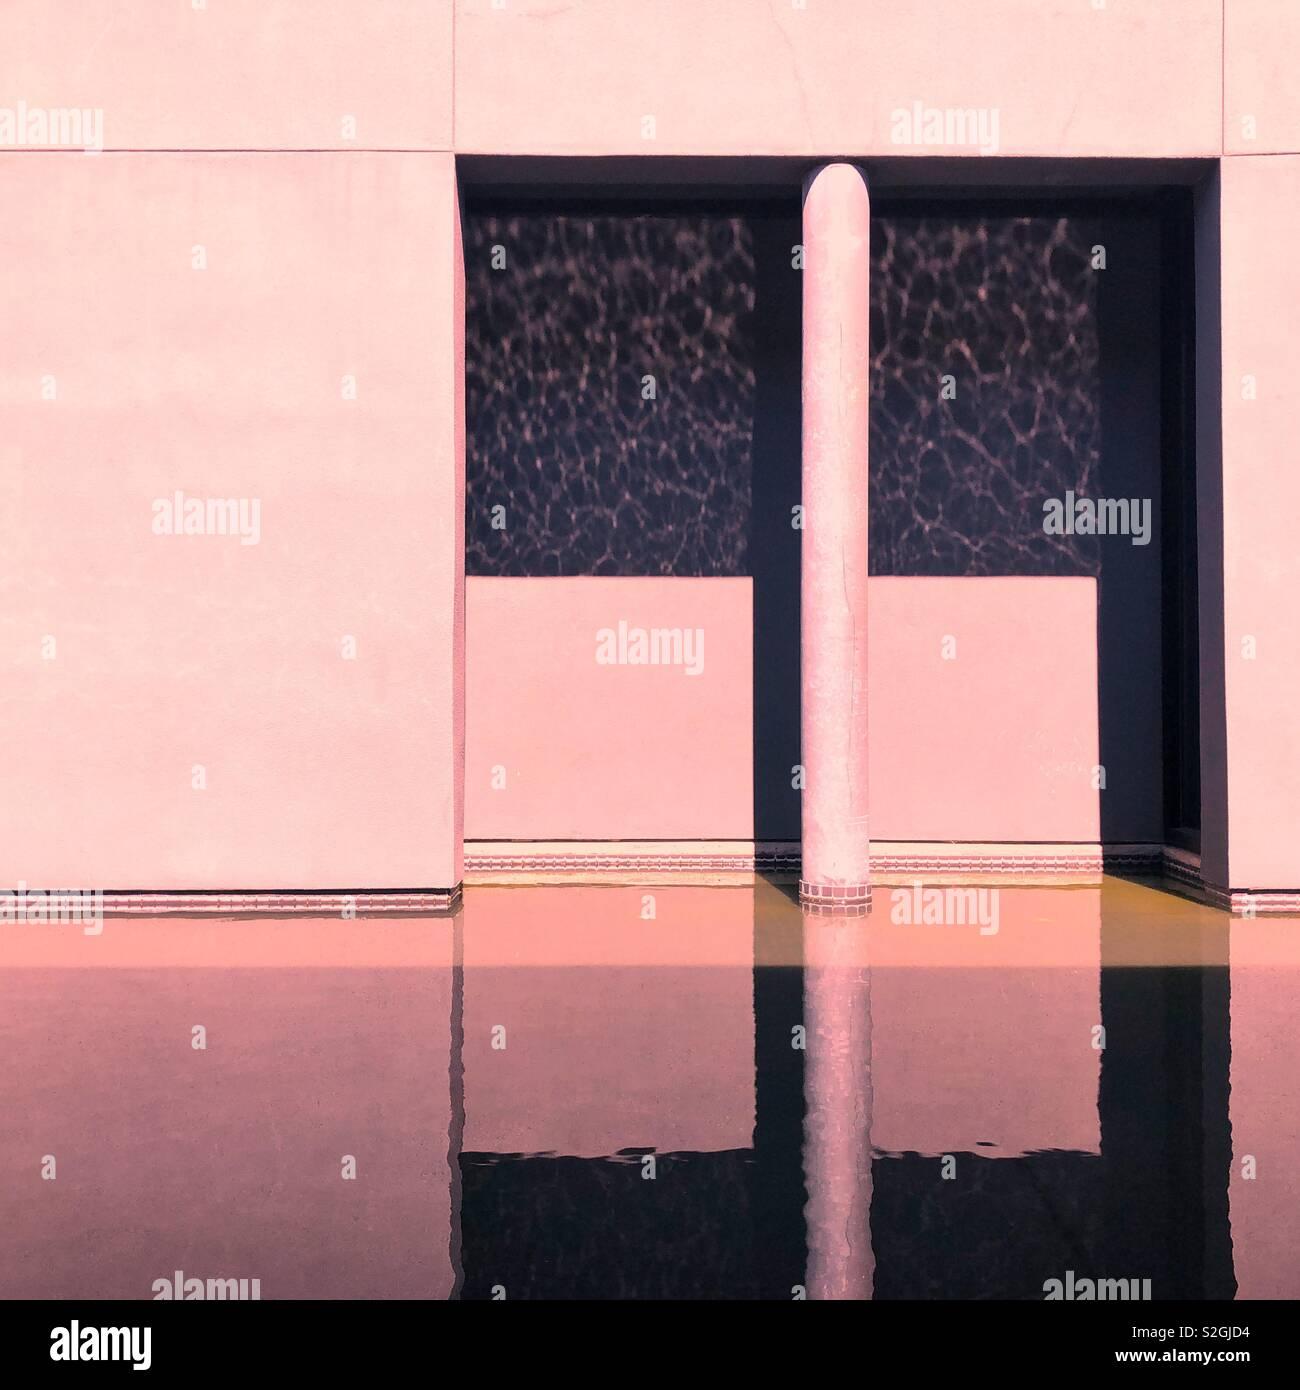 Resumen la reflexión arquitectónica Imagen De Stock